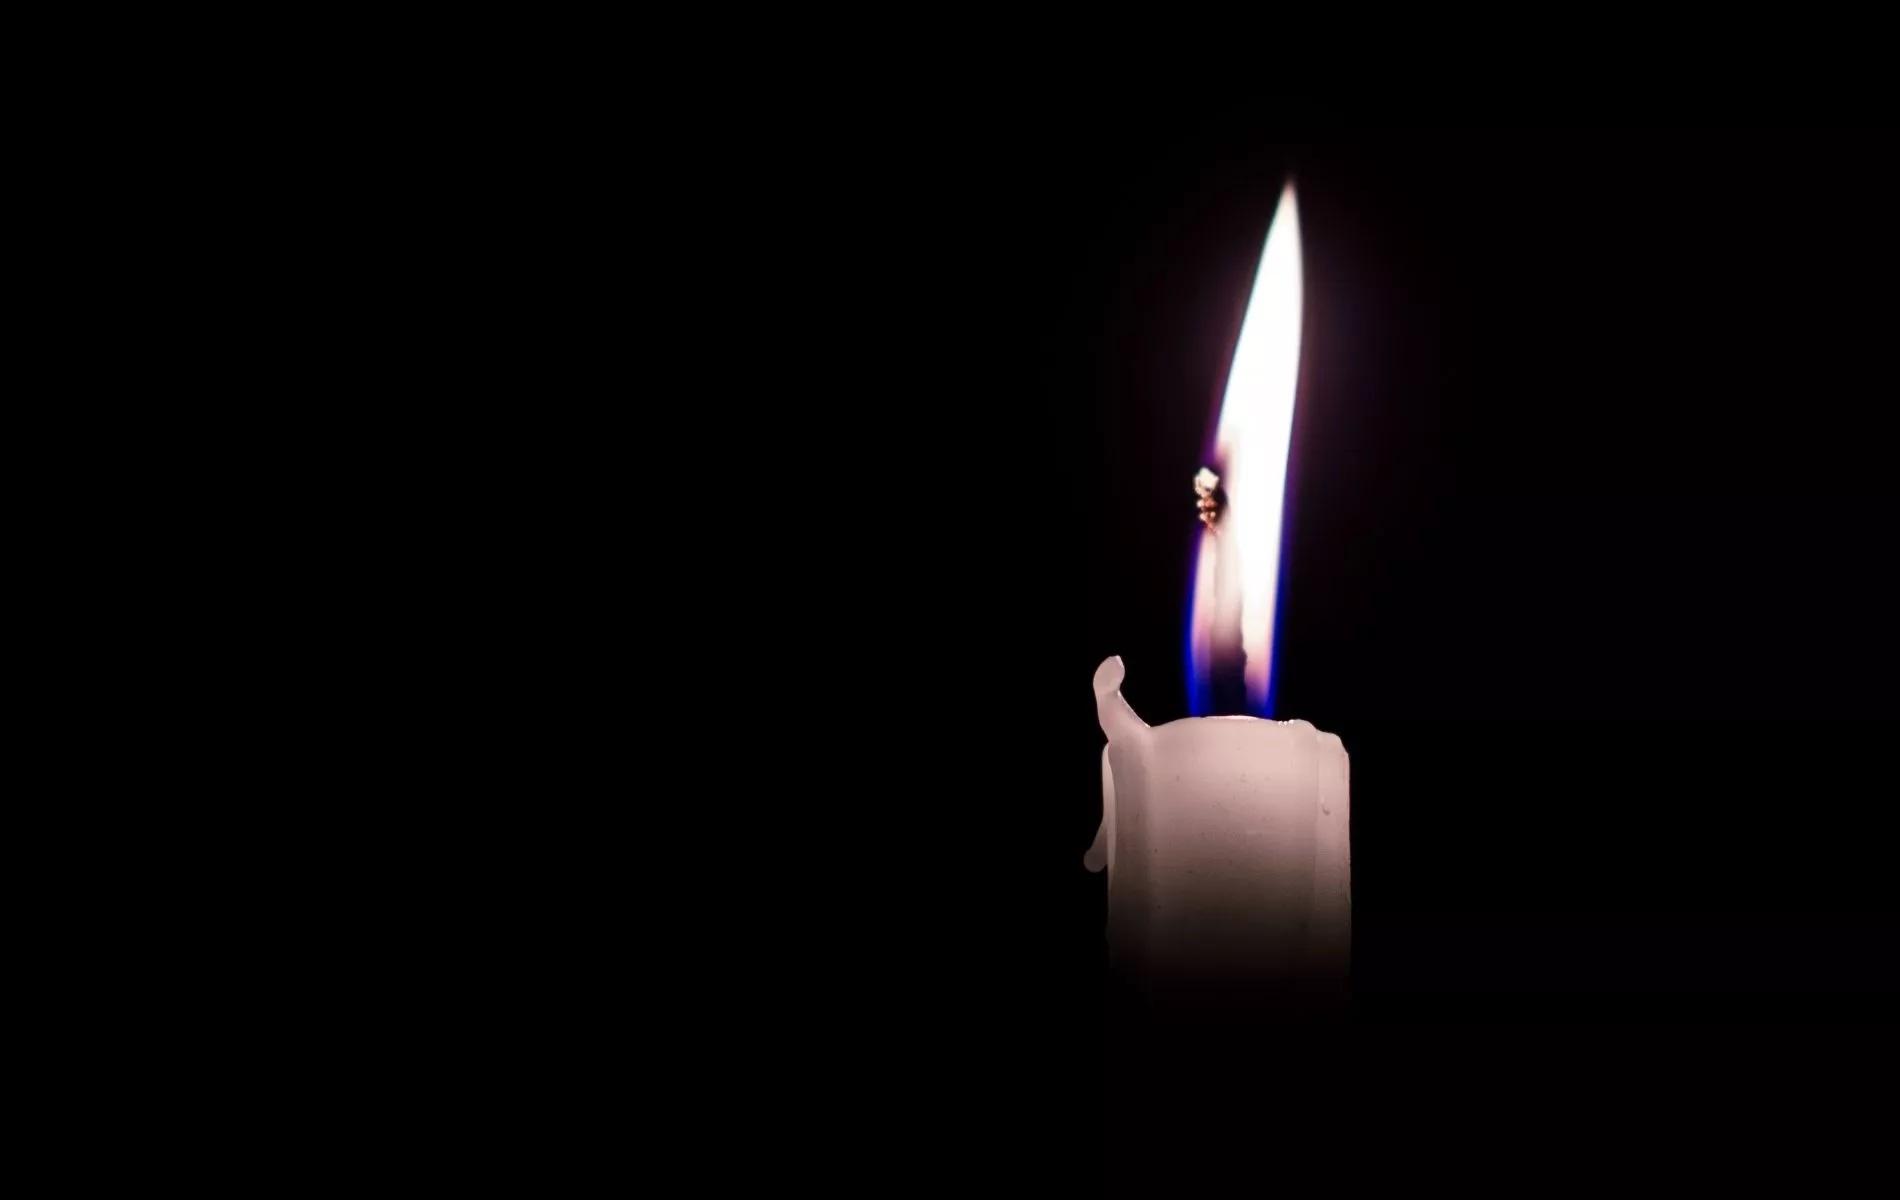 Candle black wallpaper